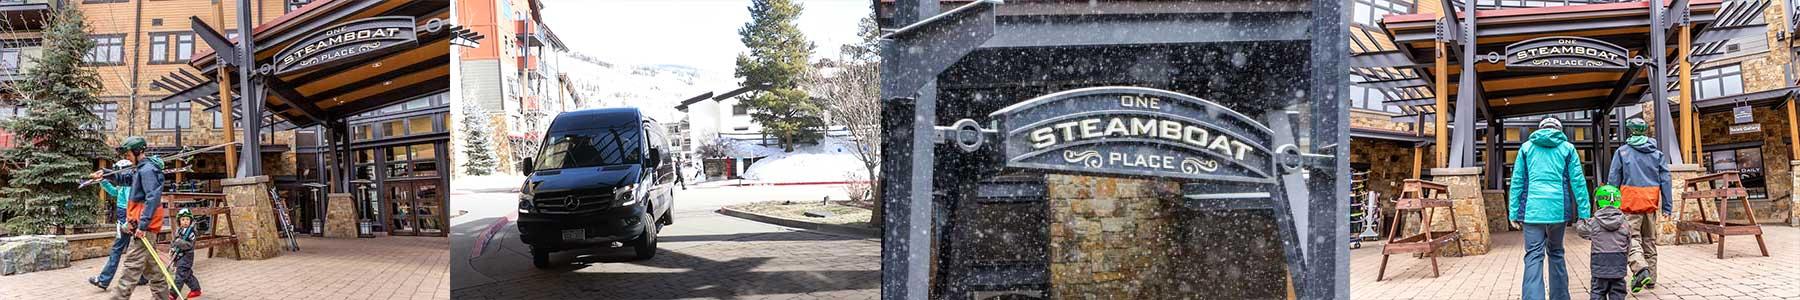 valet parking photo reel - Alpine Mountain Summit Club